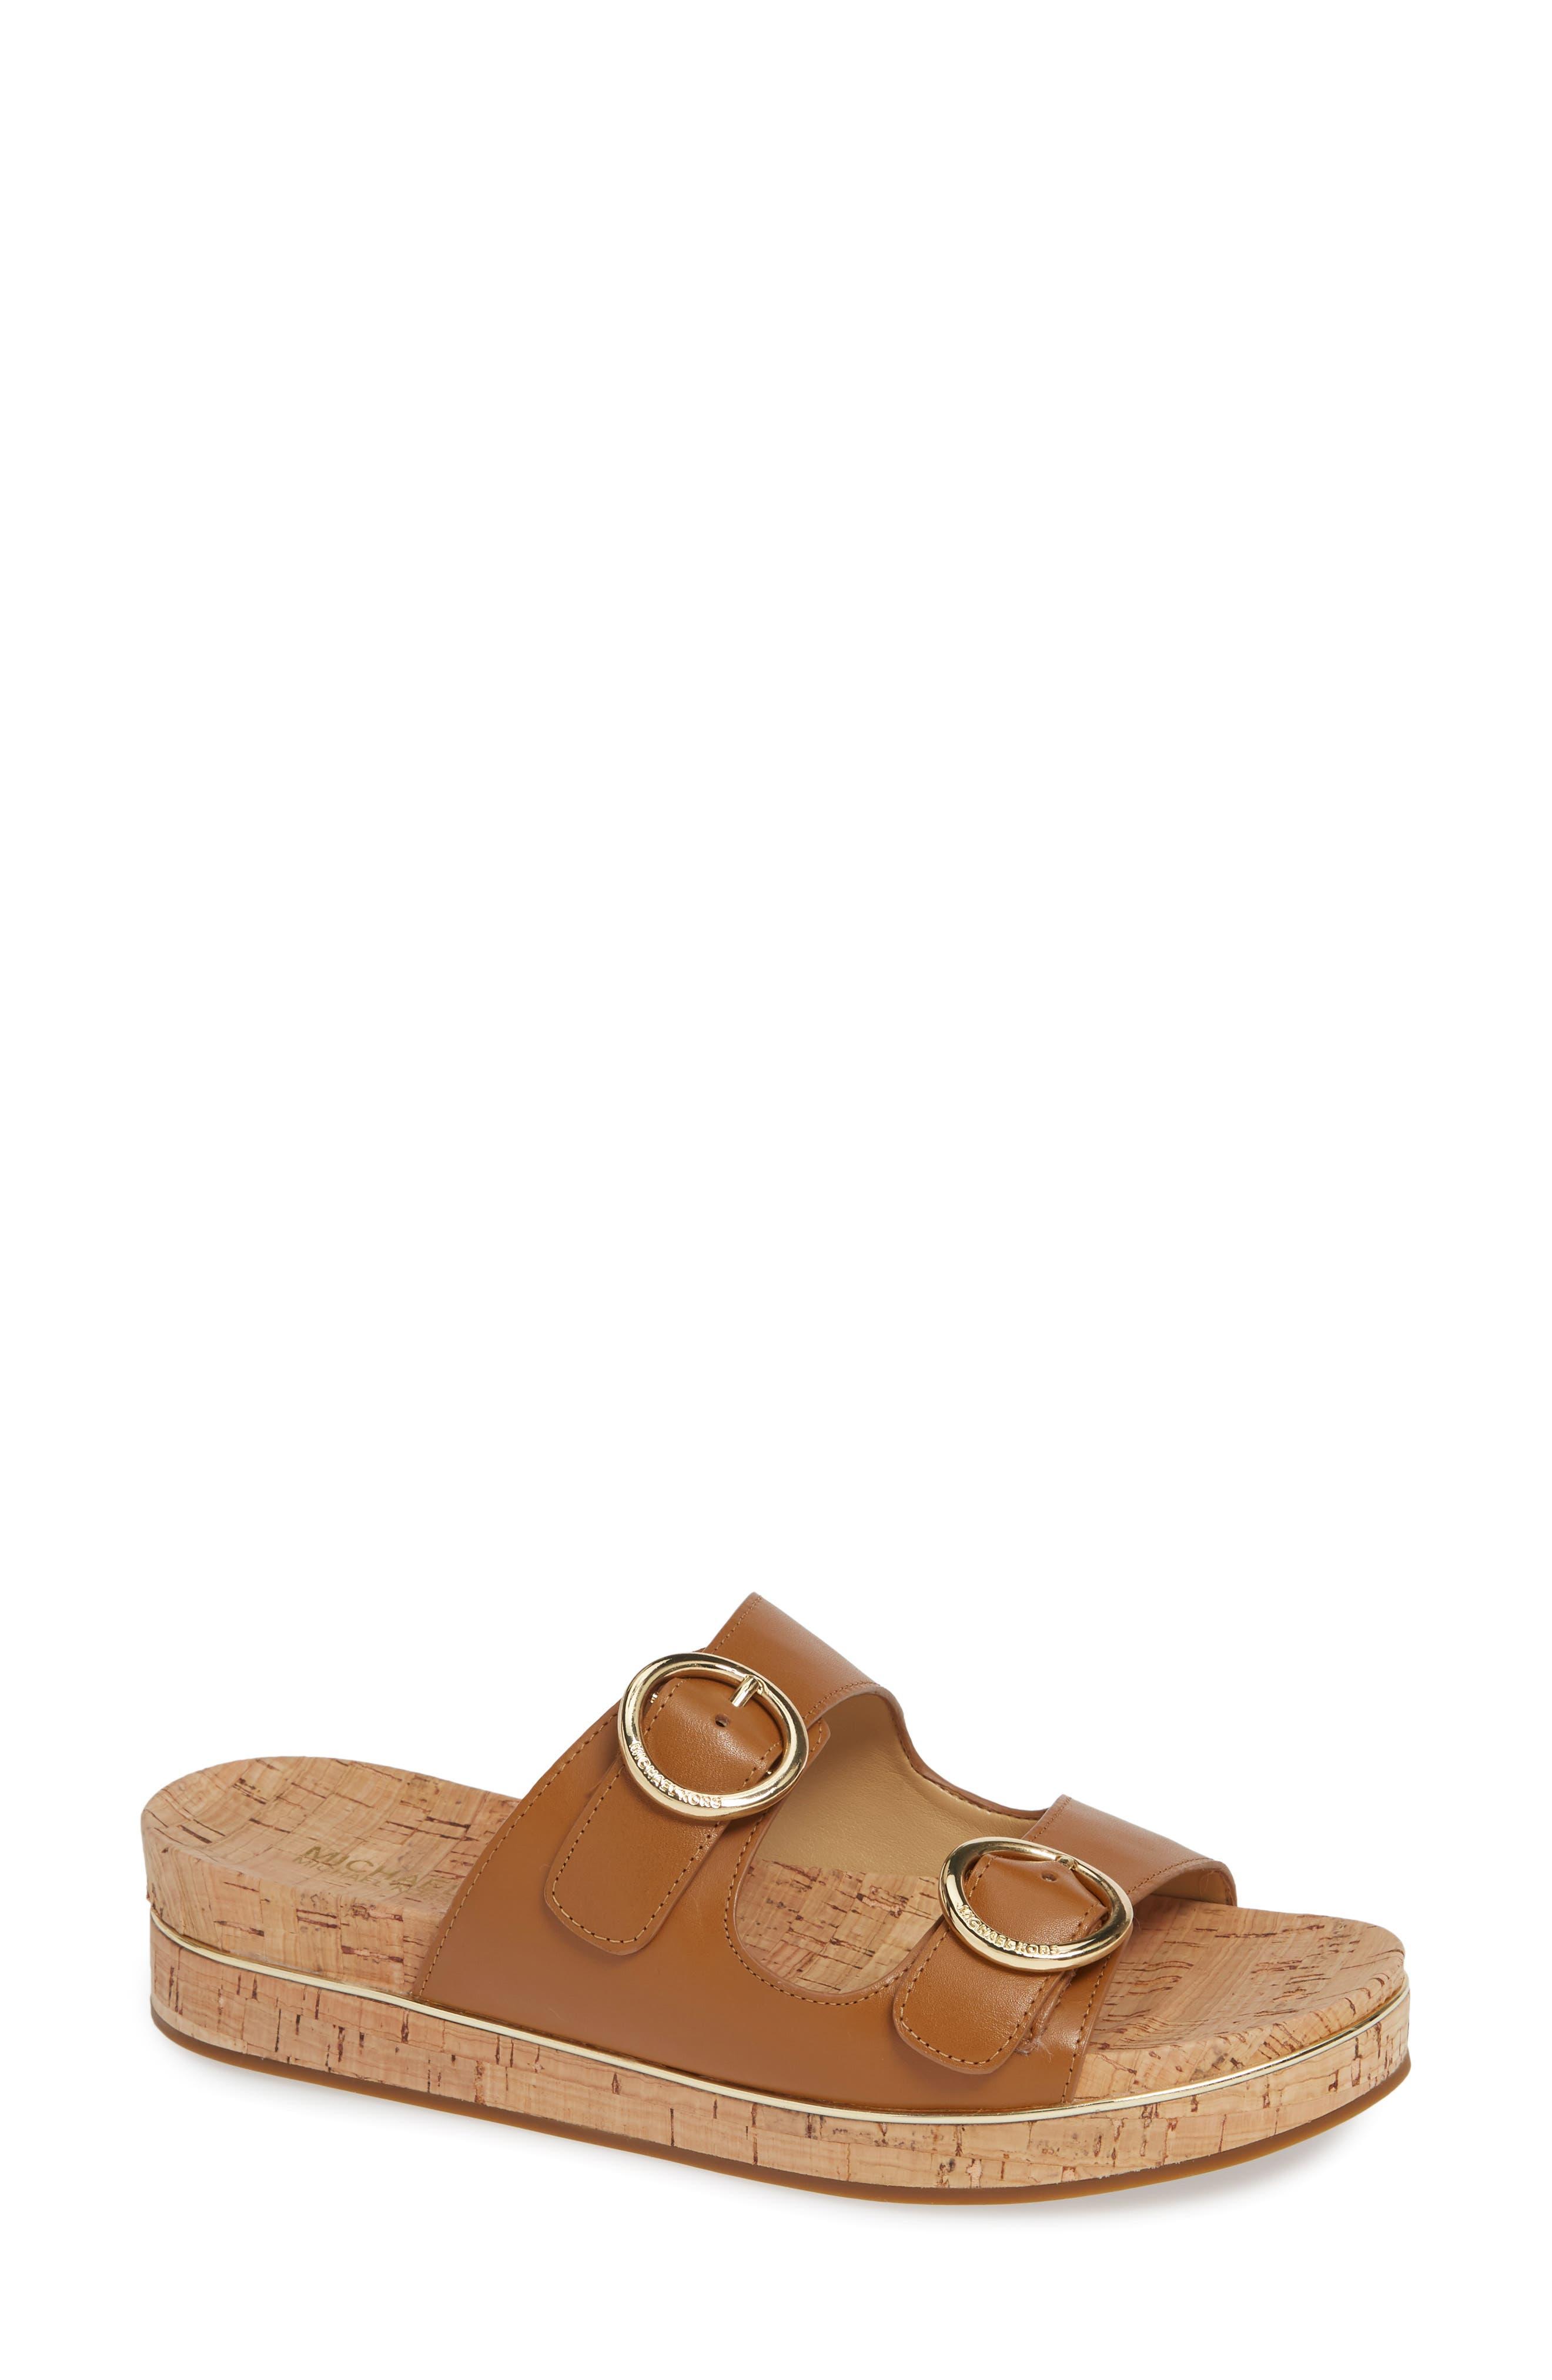 Estelle Slide Sandal, Main, color, ACORN VACHETTA LEATHER